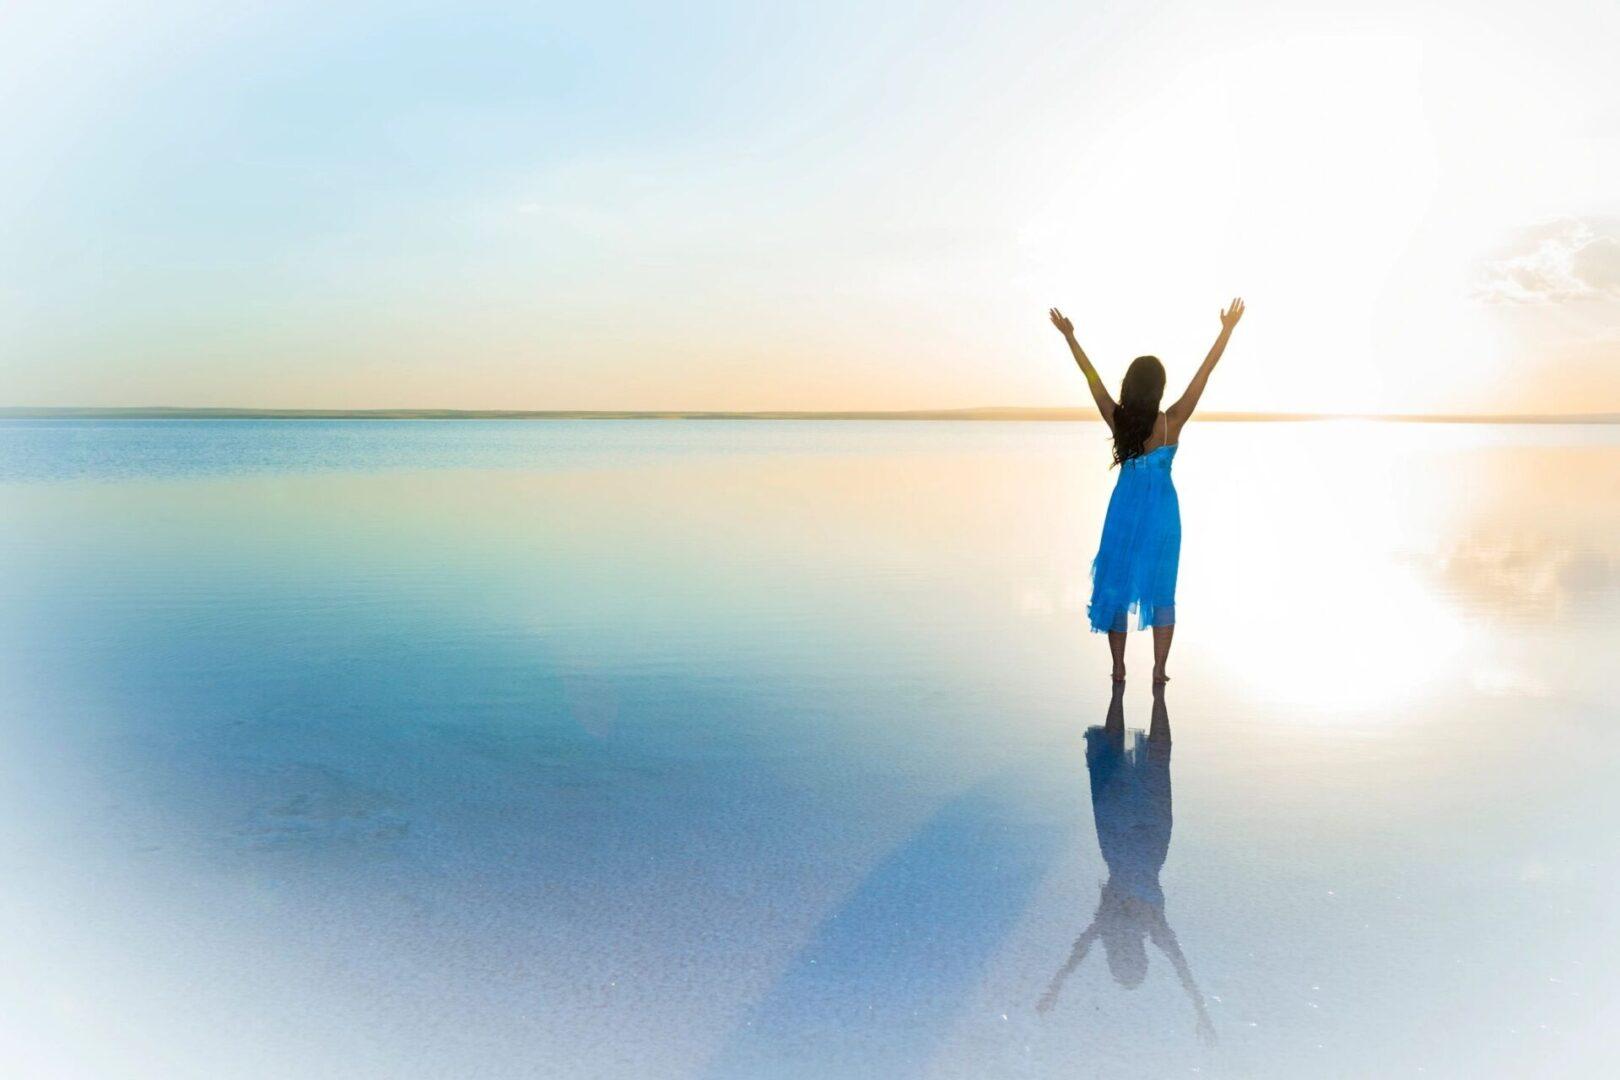 Are You An Aspiring Life Coach?